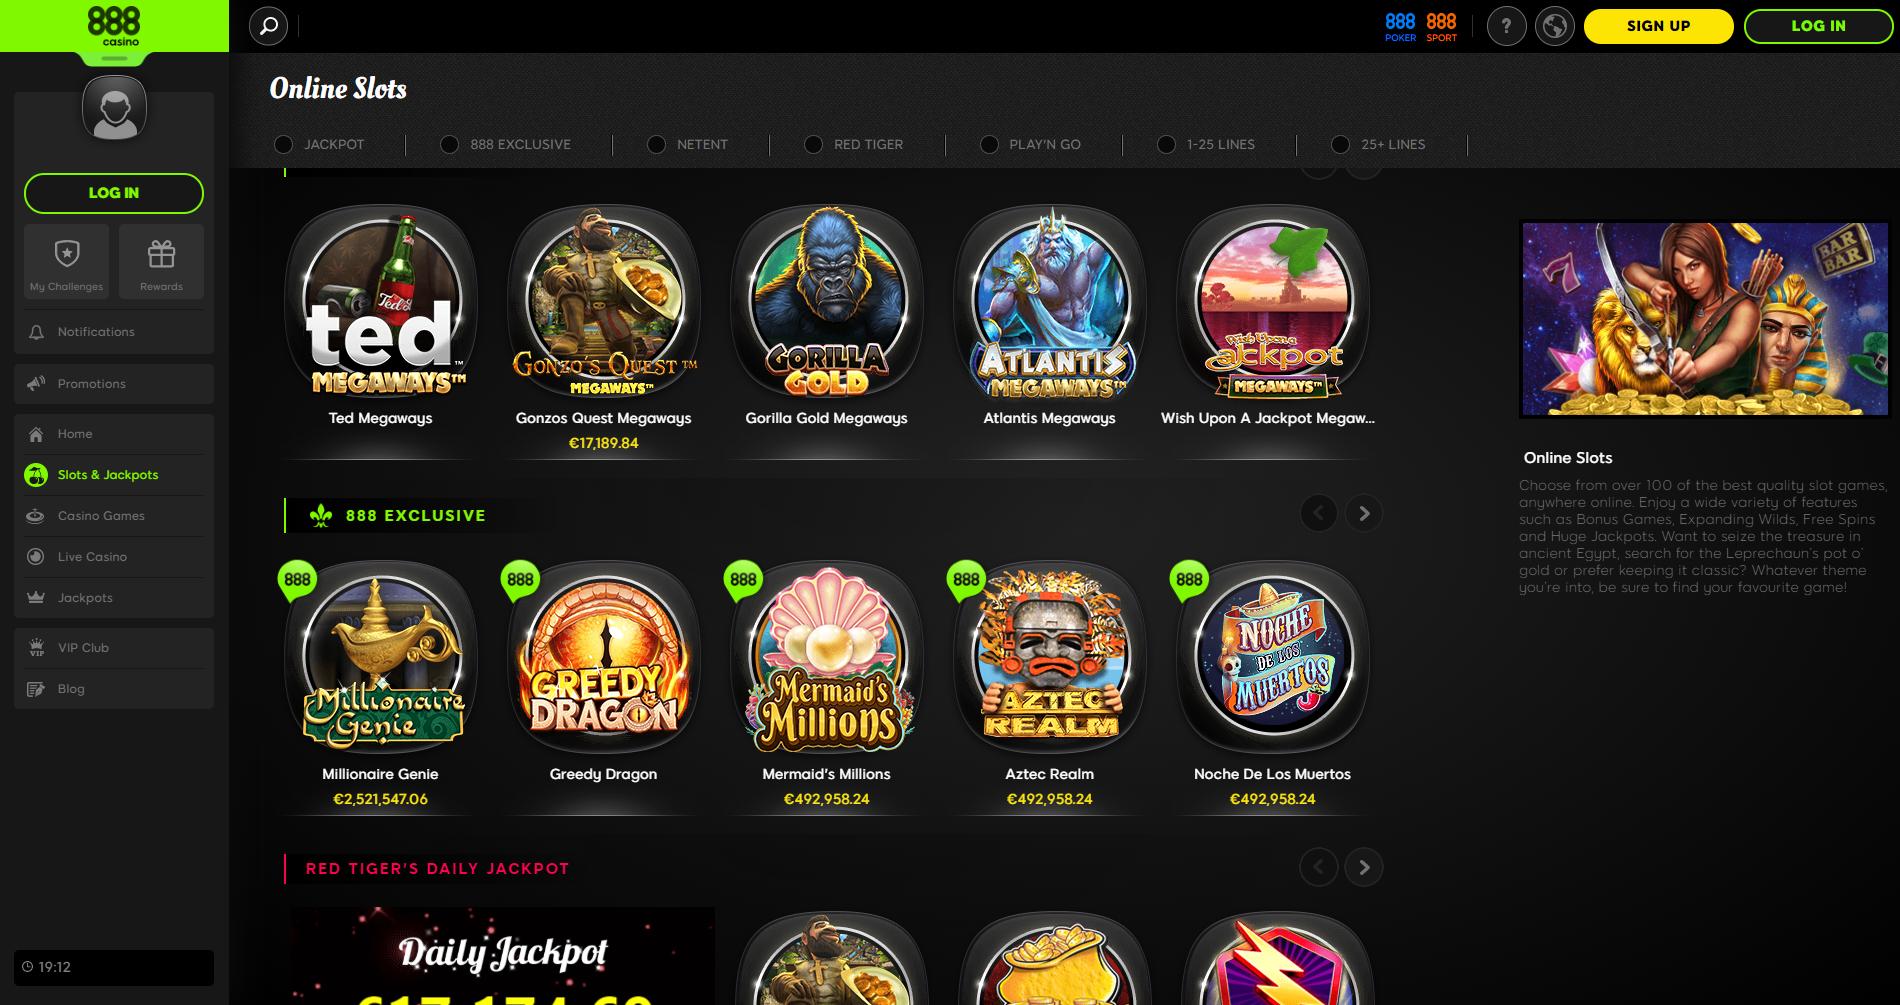 888 casino online slots lošimo automatai ted gonzo quest gorilla gold atlantis megaways millionaire genie